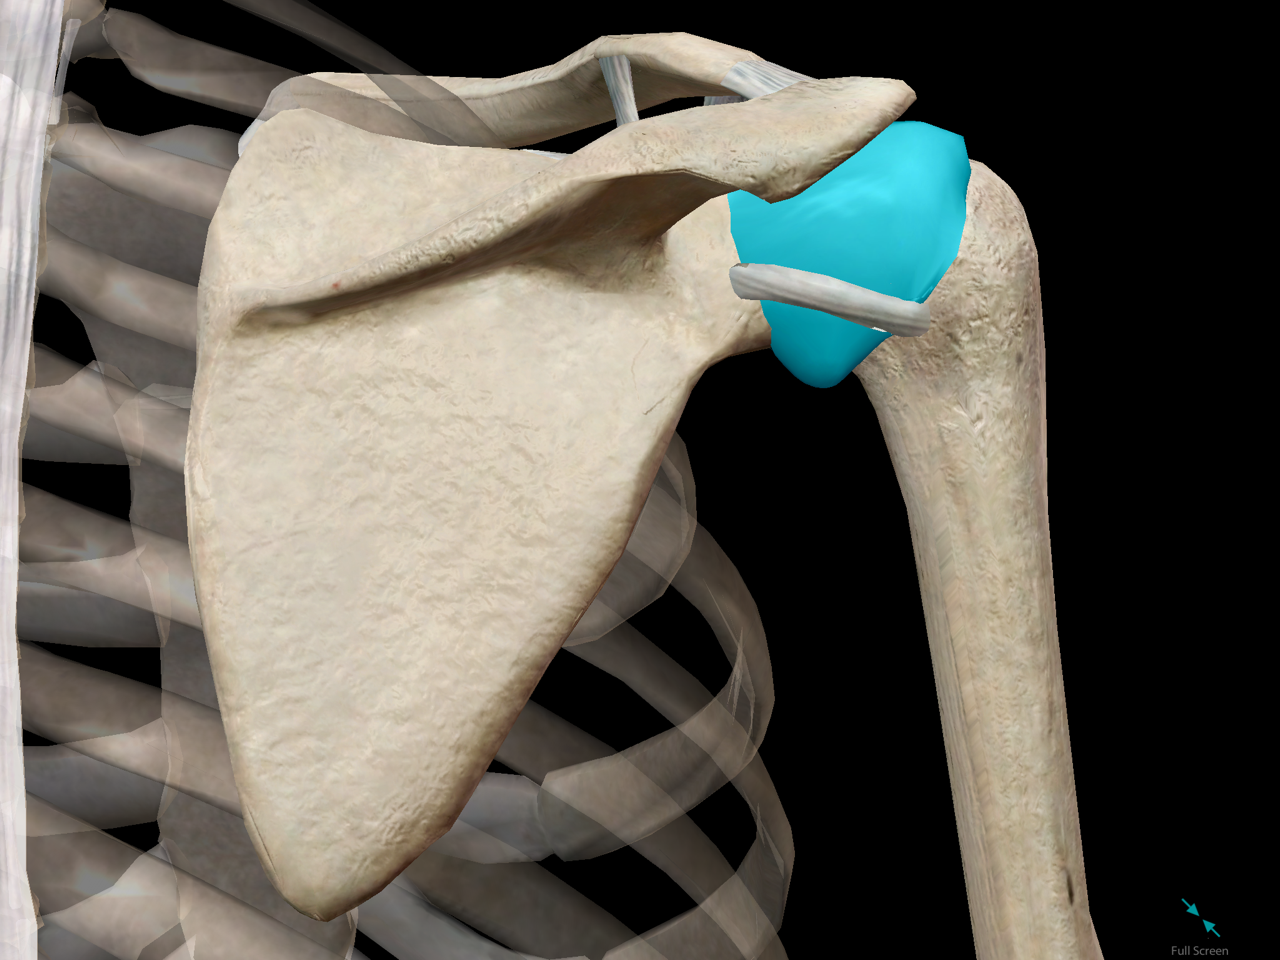 shoulder-girdle-glenoid-cavity-joint.png